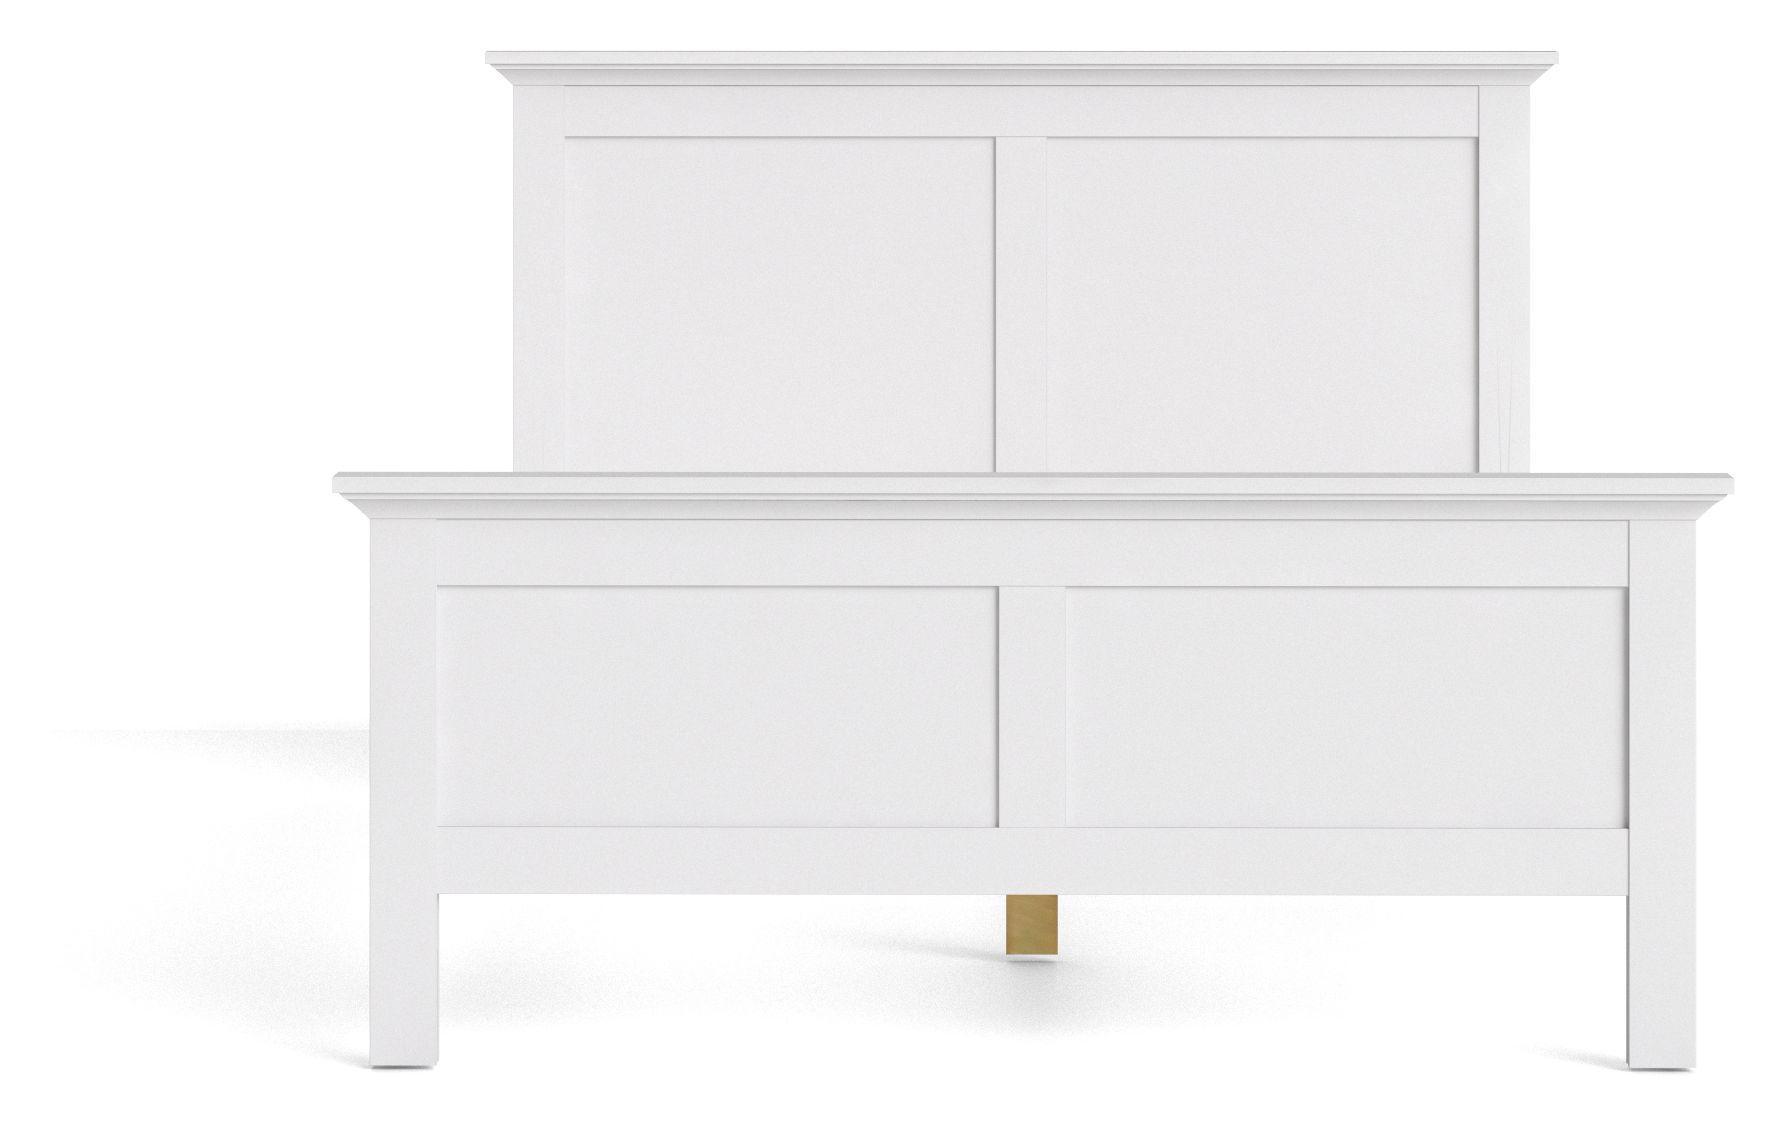 Paris seng - 140 cm - Hvid romantisk seng med lameller - 200x140 cm